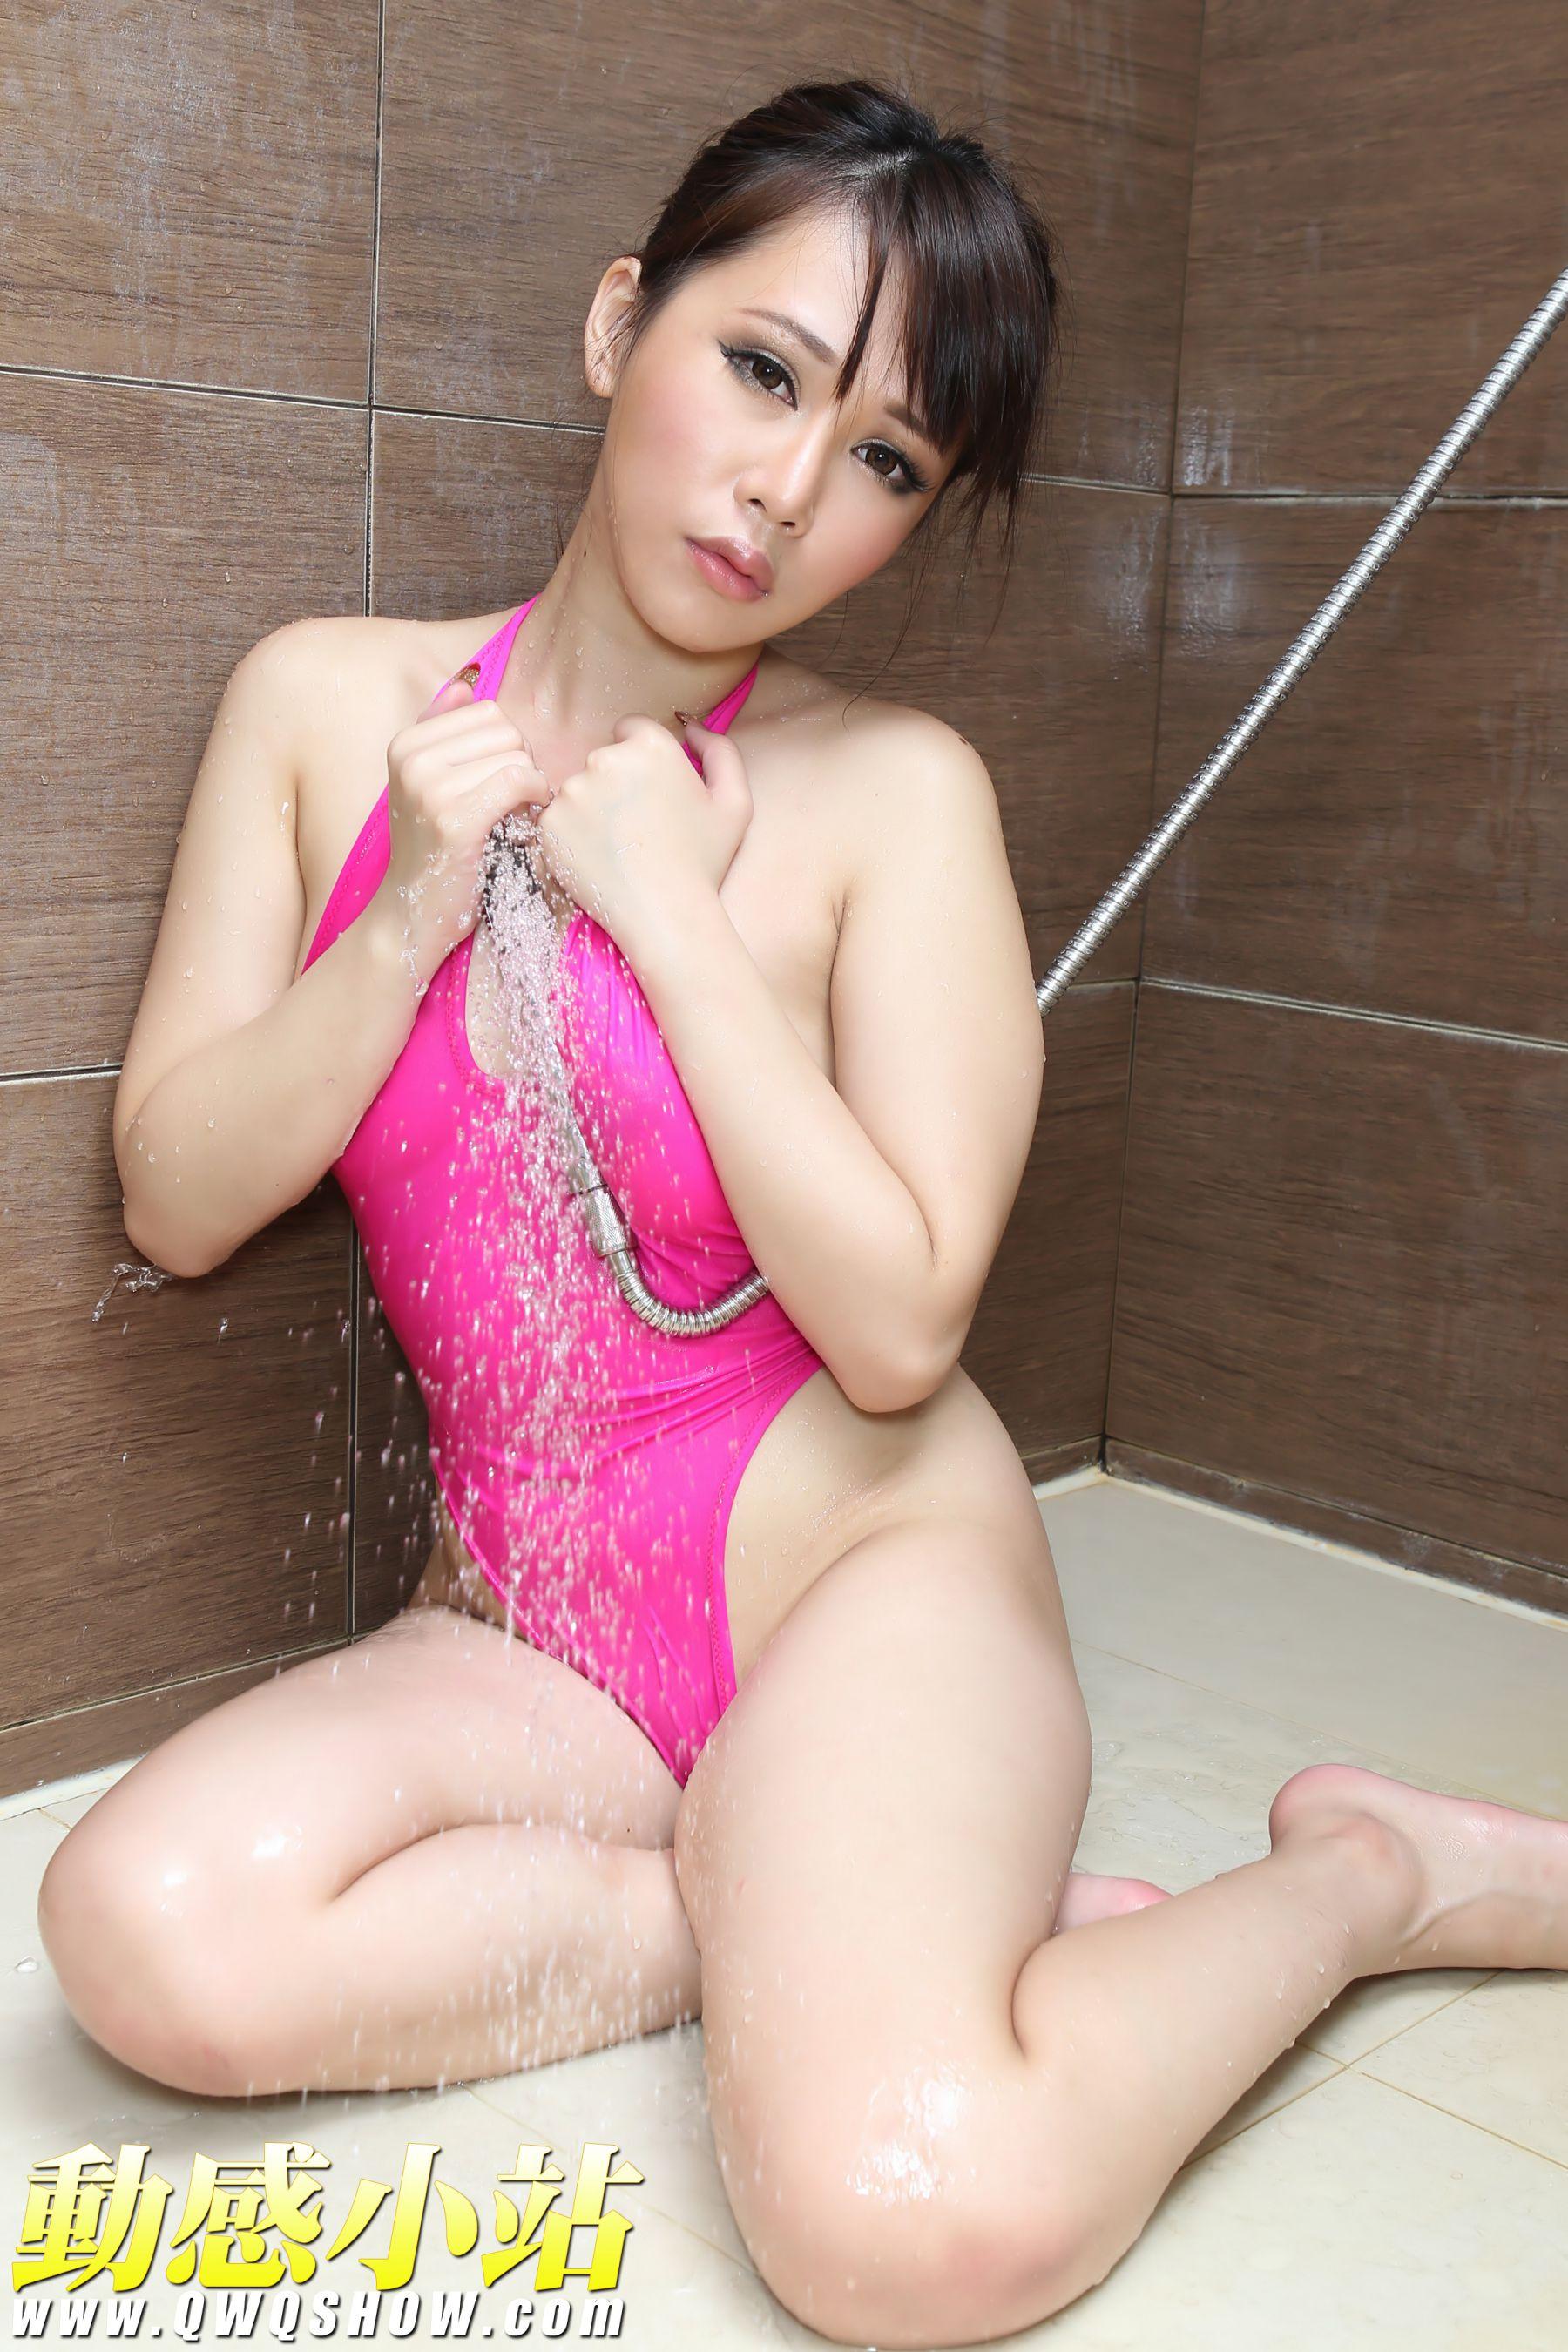 VOL.285 [动感之星]诱惑湿身浴室粉嫩:妖精(动感小站妖精,动感之星妖精)高品质写真套图(50P)